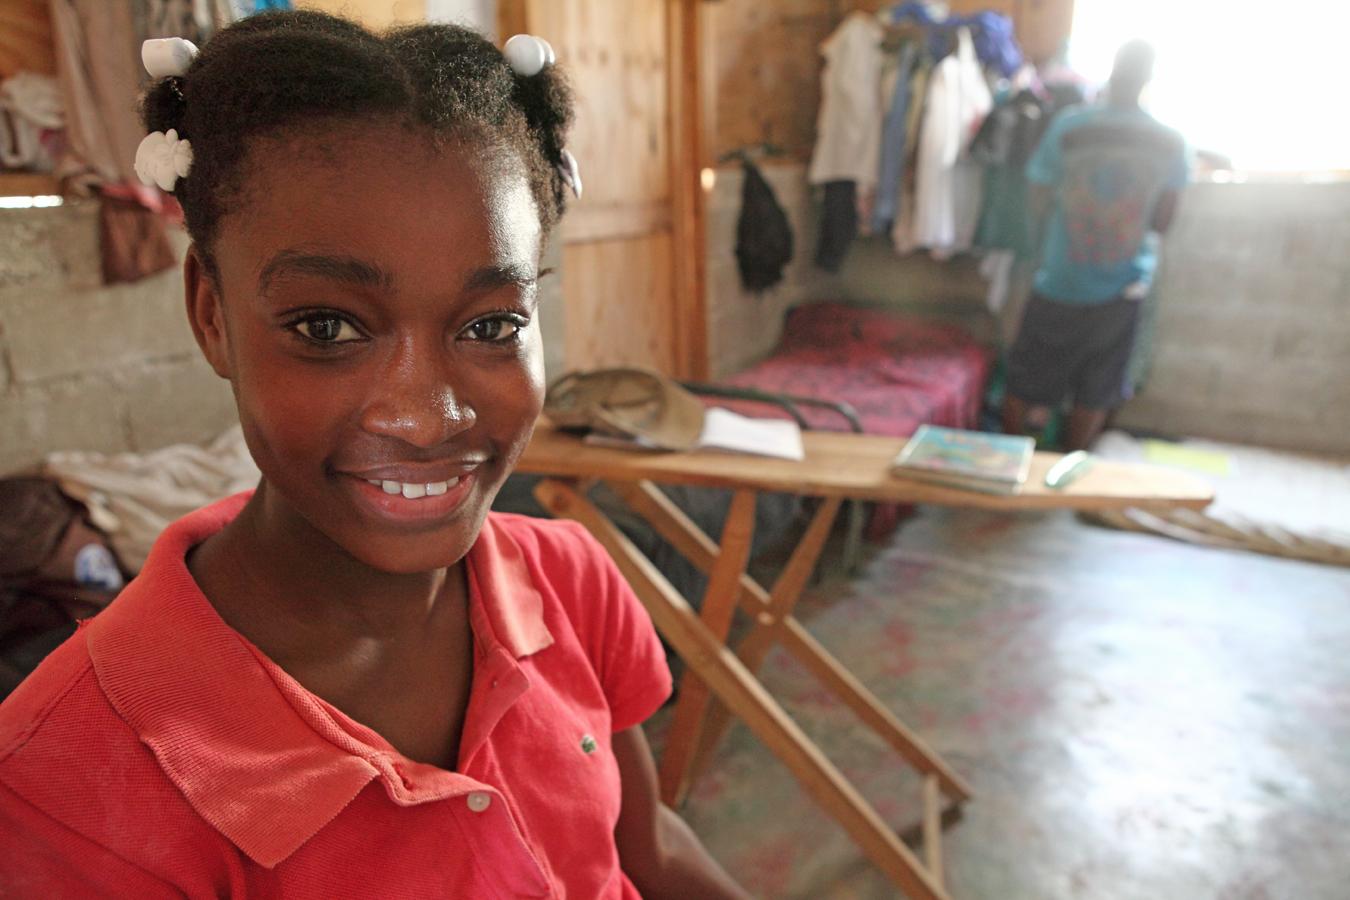 Dream of safe housing in Haiti is closer than before earthquake